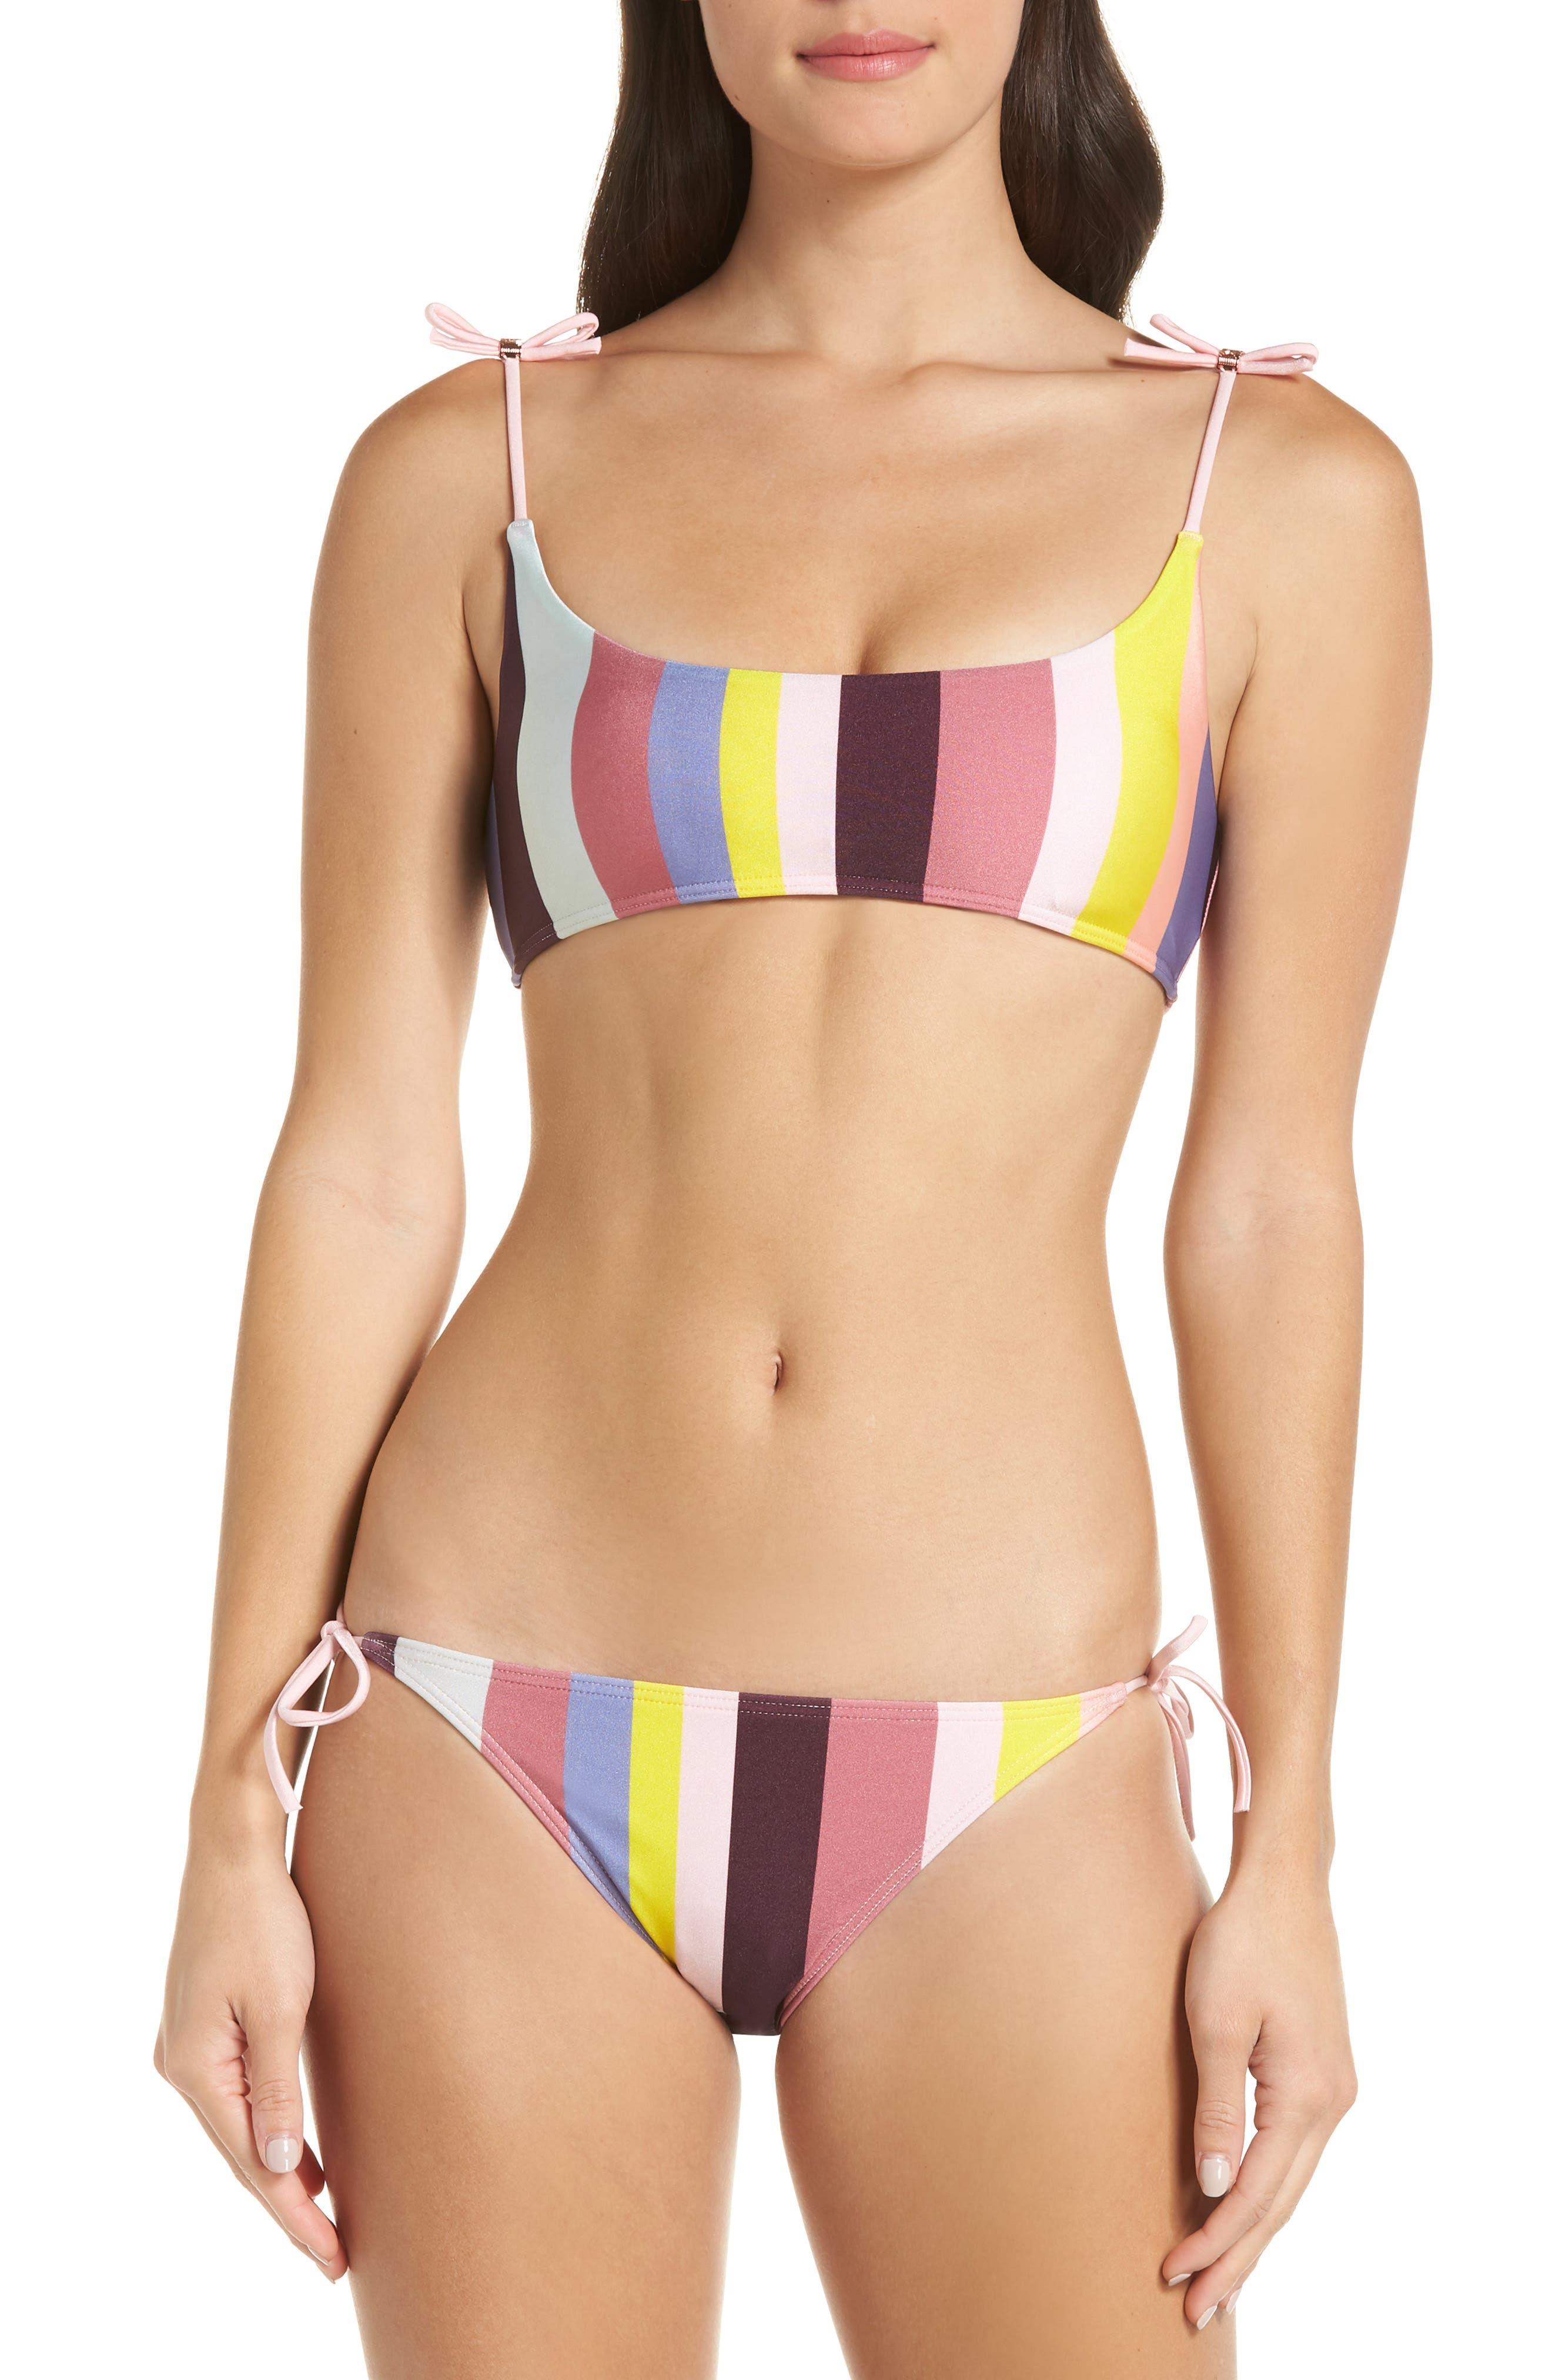 Penora Rio Stripe Bikini Top,                             Alternate thumbnail 7, color,                             LIGHT PINK